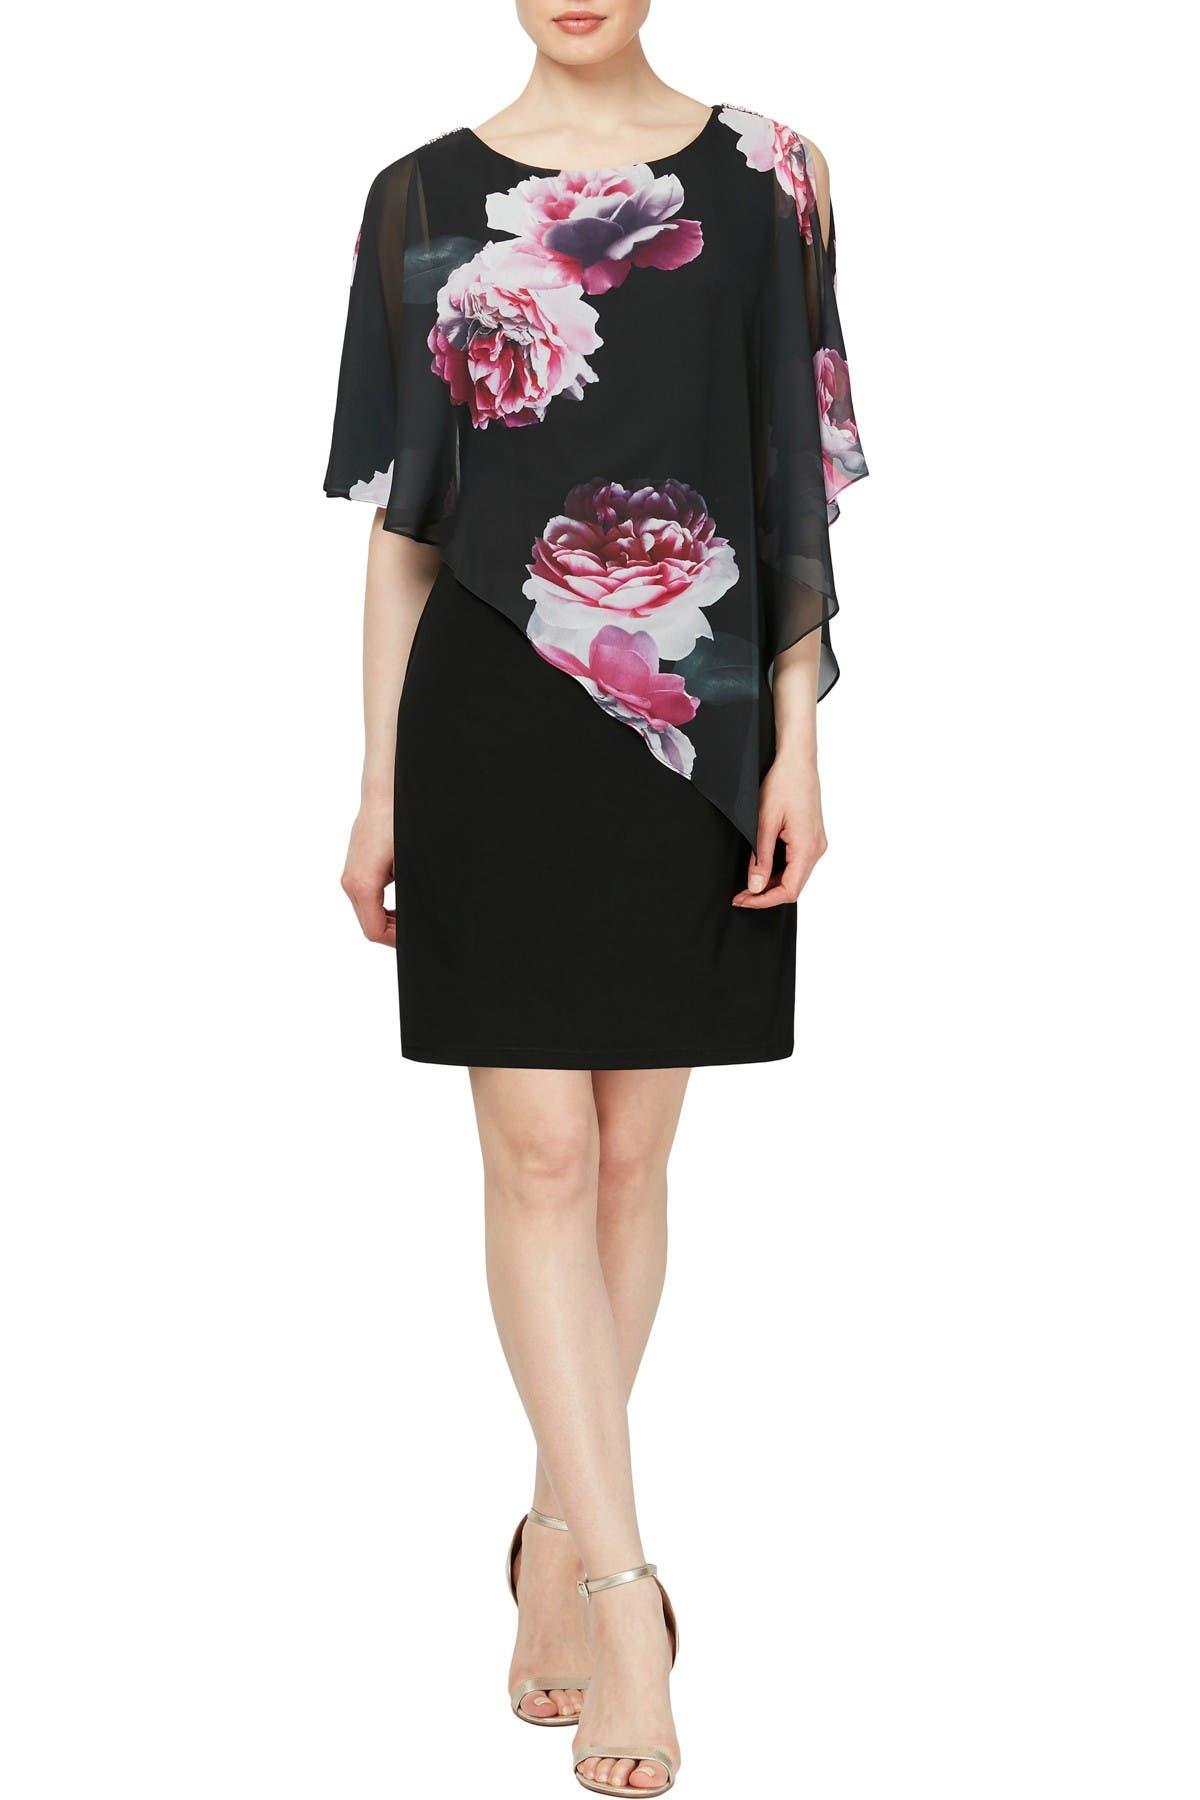 Image of SLNY Floral Chiffon Overlay Sheath Dress